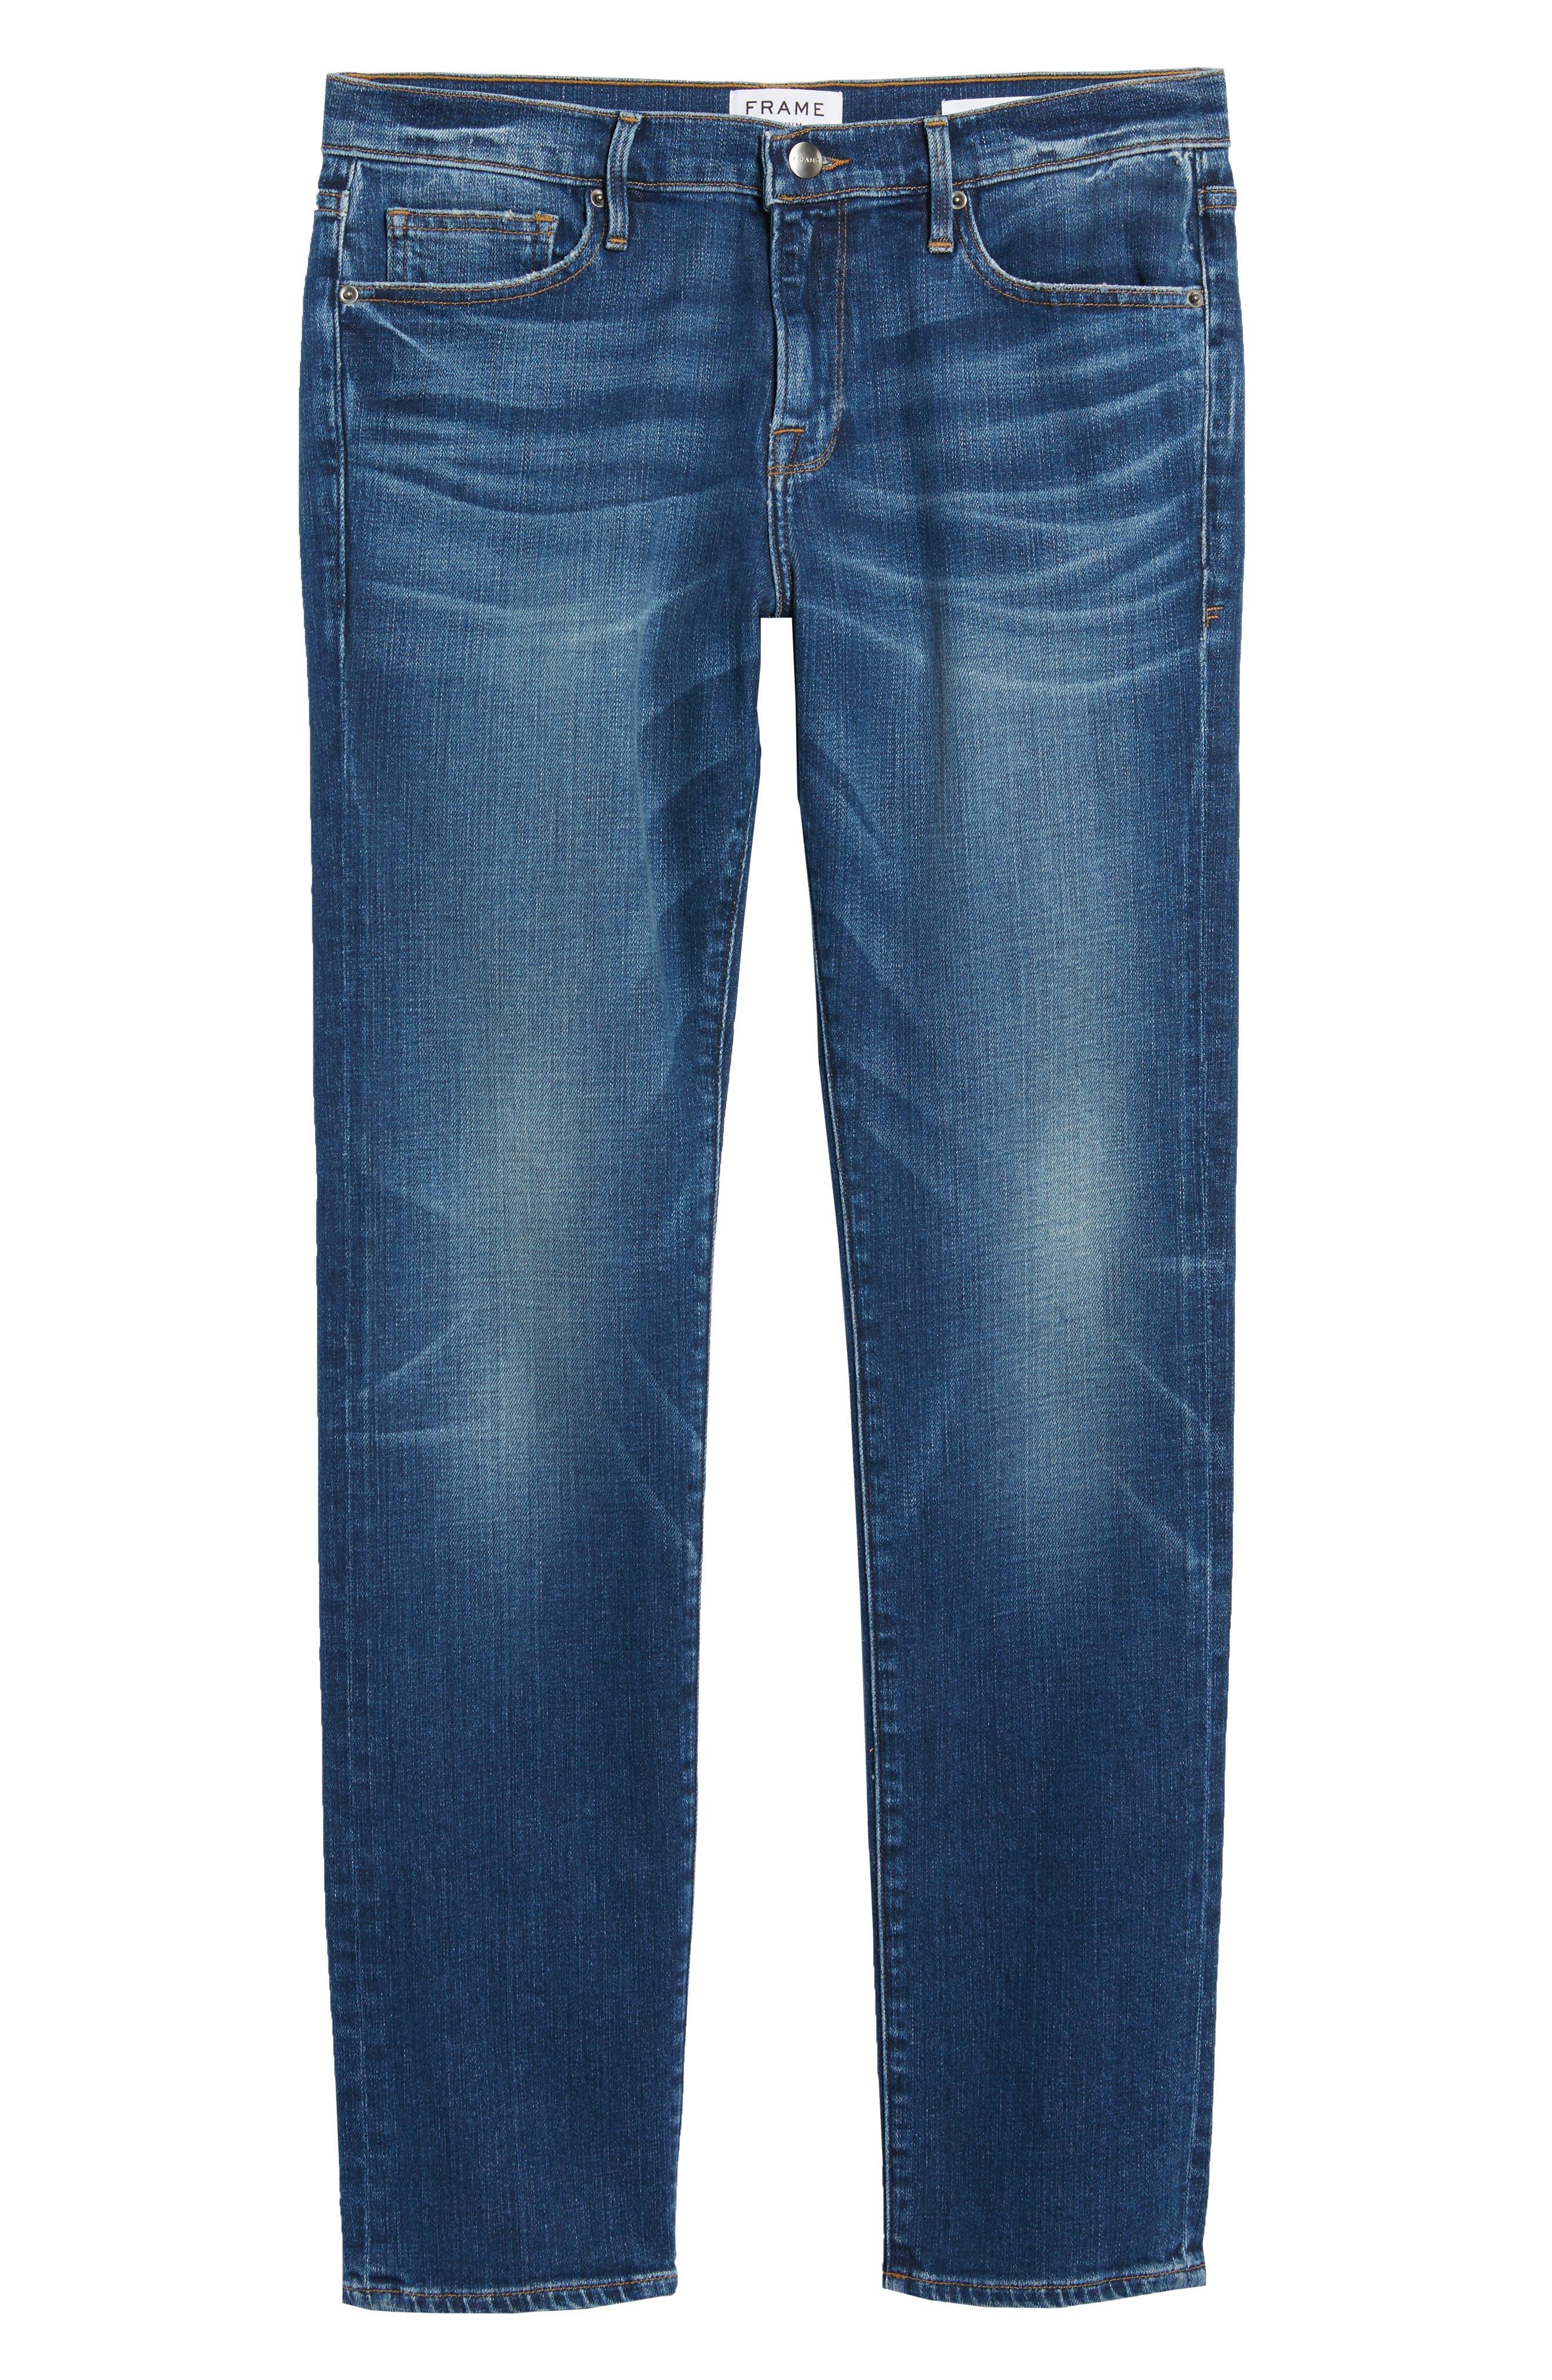 L'Homme Skinny Fit Jeans,                             Alternate thumbnail 6, color,                             420